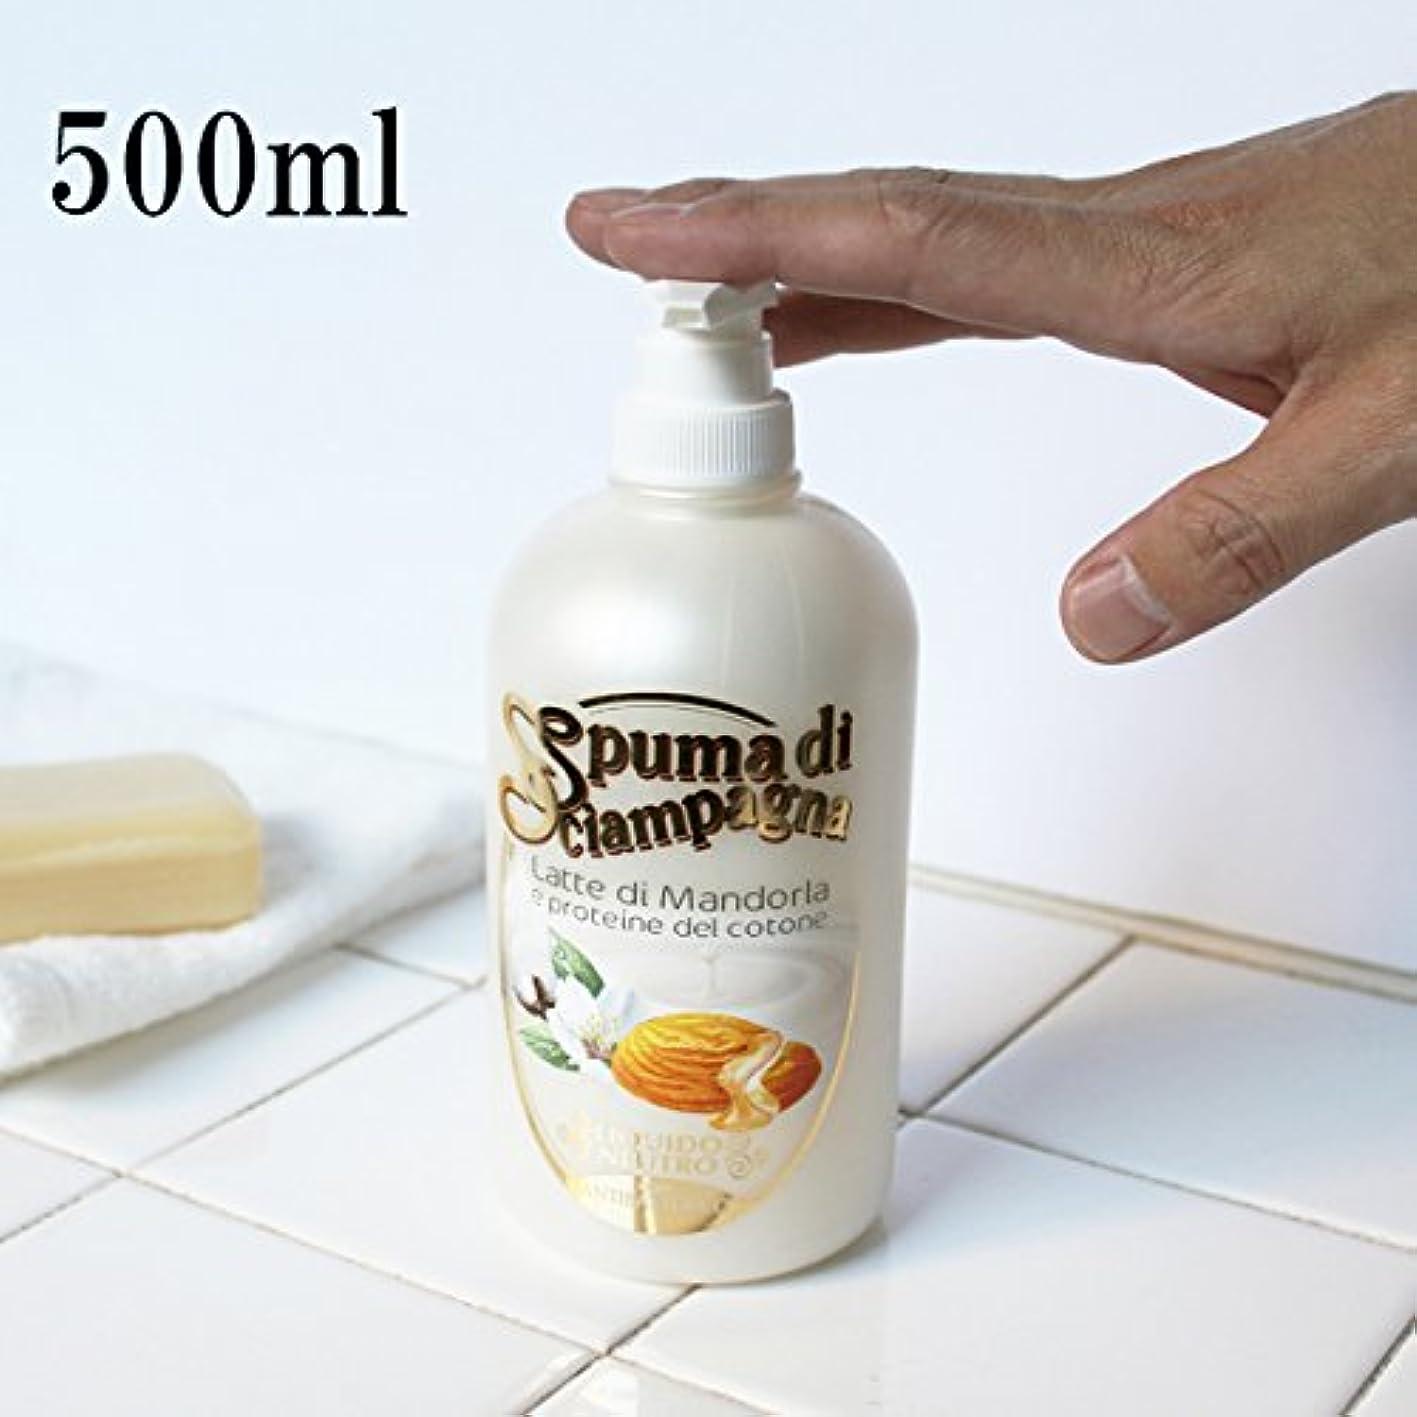 Spuma di Sciampagna (スプーマ ディ シャンパーニャ) リキッドソープ 500ml アーモンドの香り